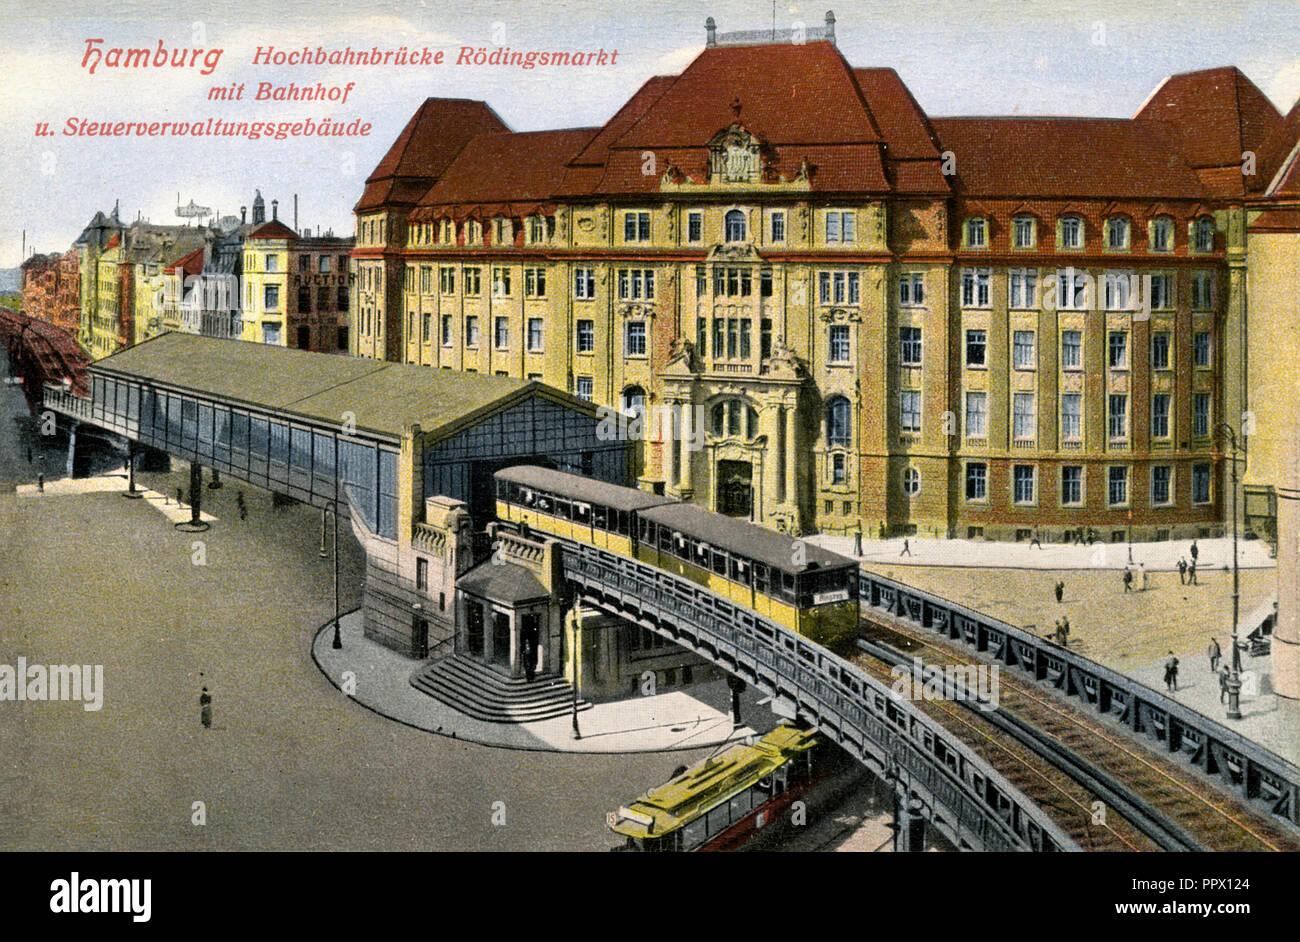 Hamburg: elevated railway bridge Rödingsmarkt with railway station and tax administration building, - Stock Image